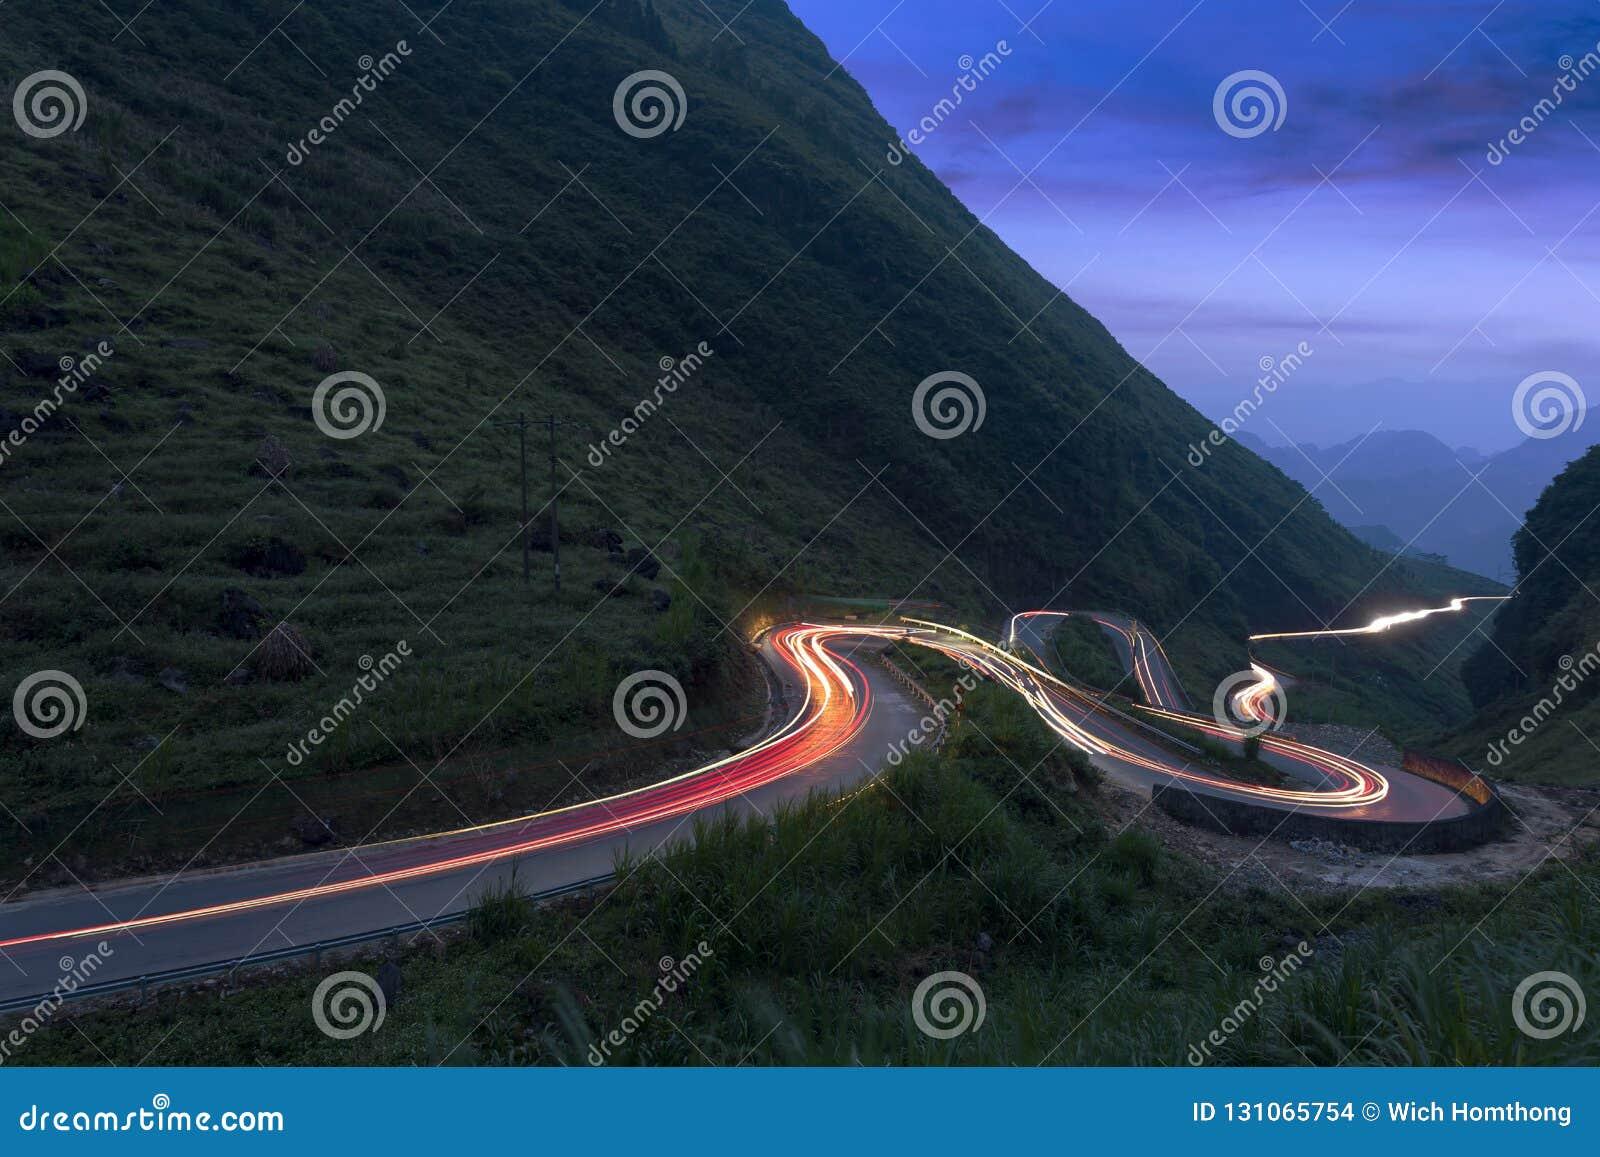 A curvy road through the grassy hills at twilight.